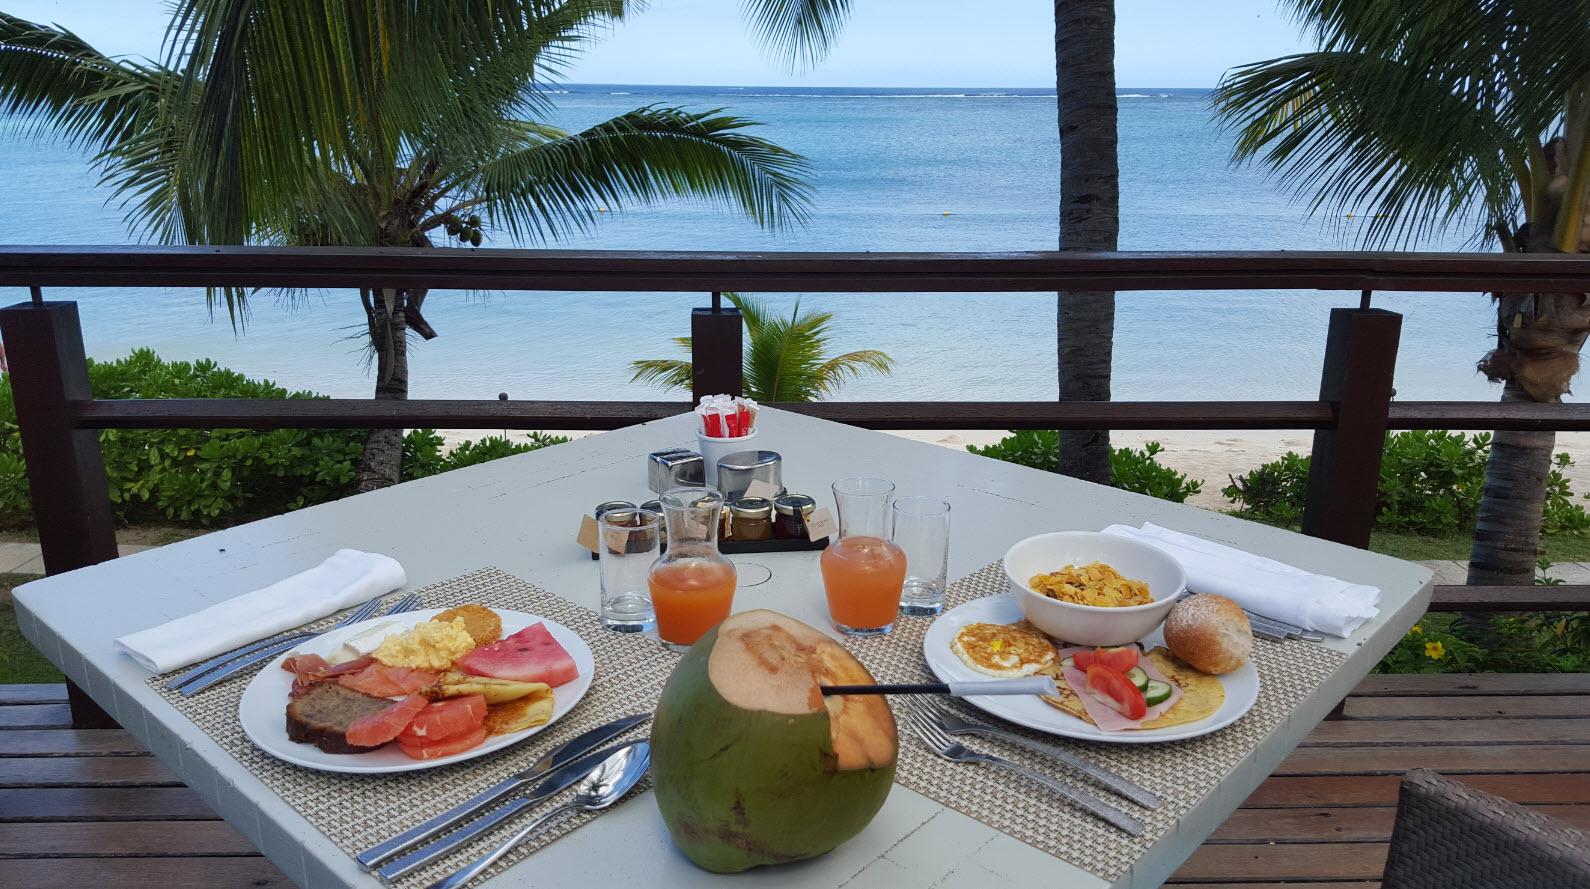 Petit dejeuner face a la mer